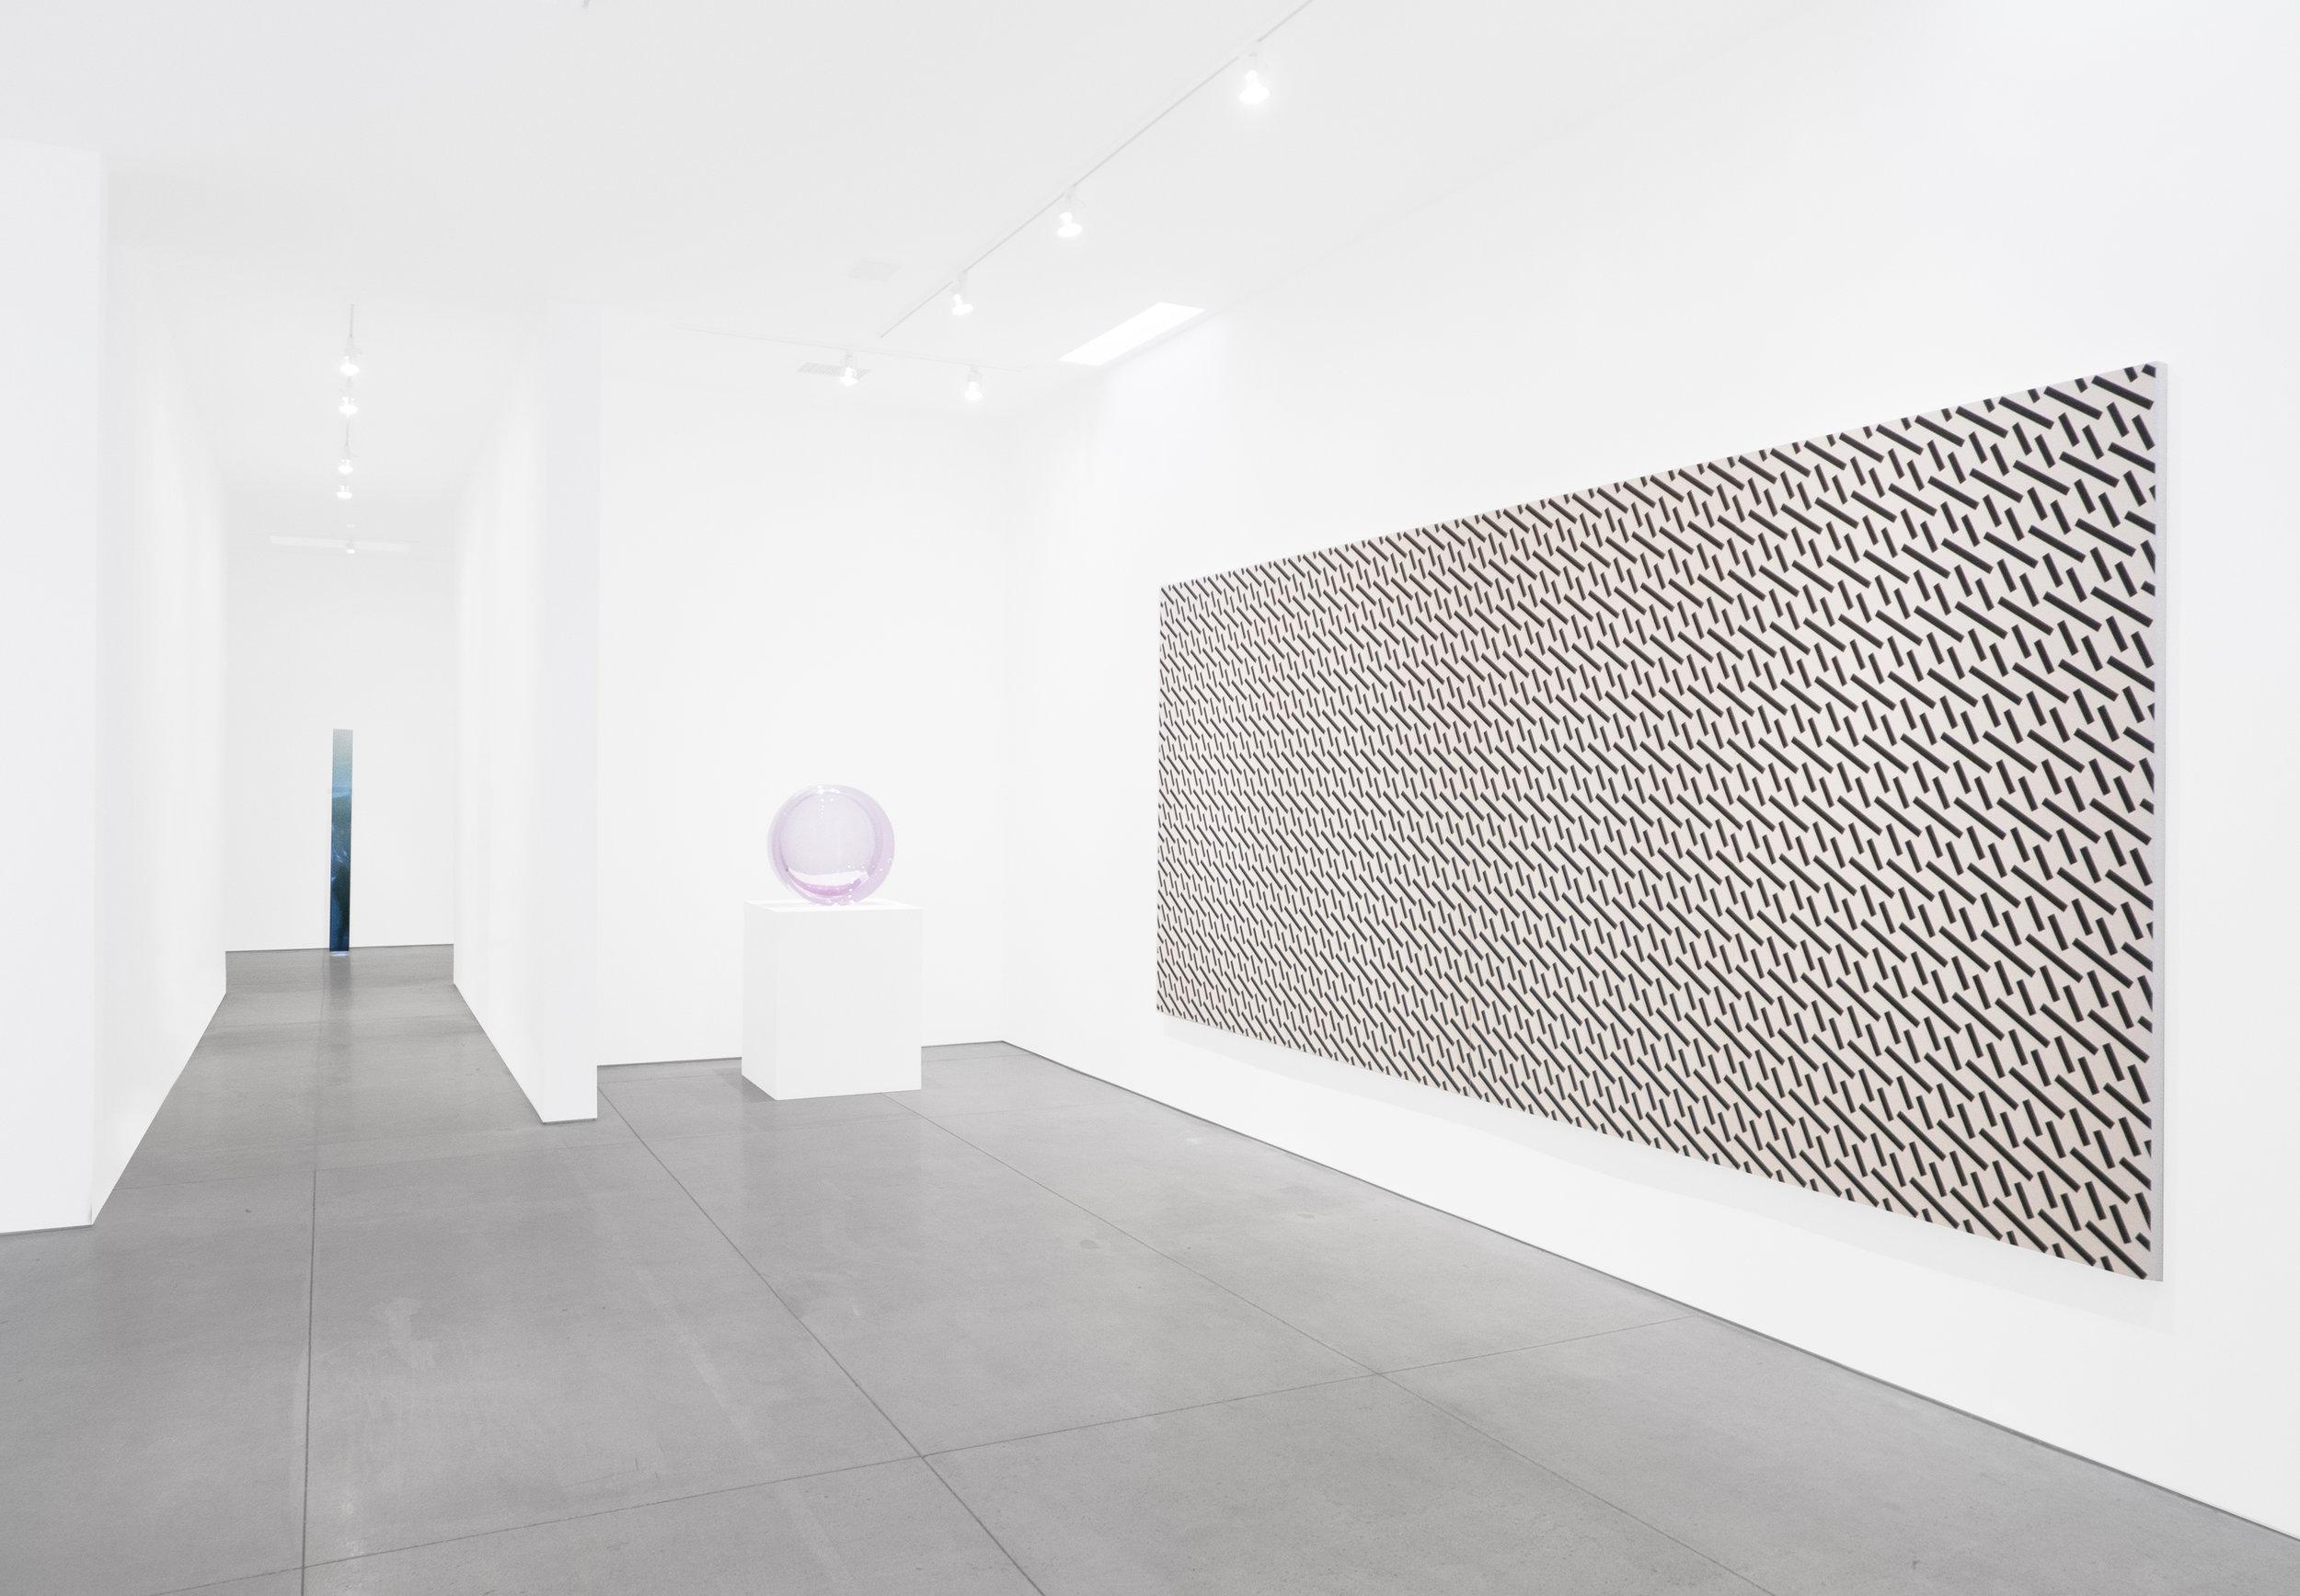 25 Years_Peter Blake Gallery_2019_Installation View_15.jpg